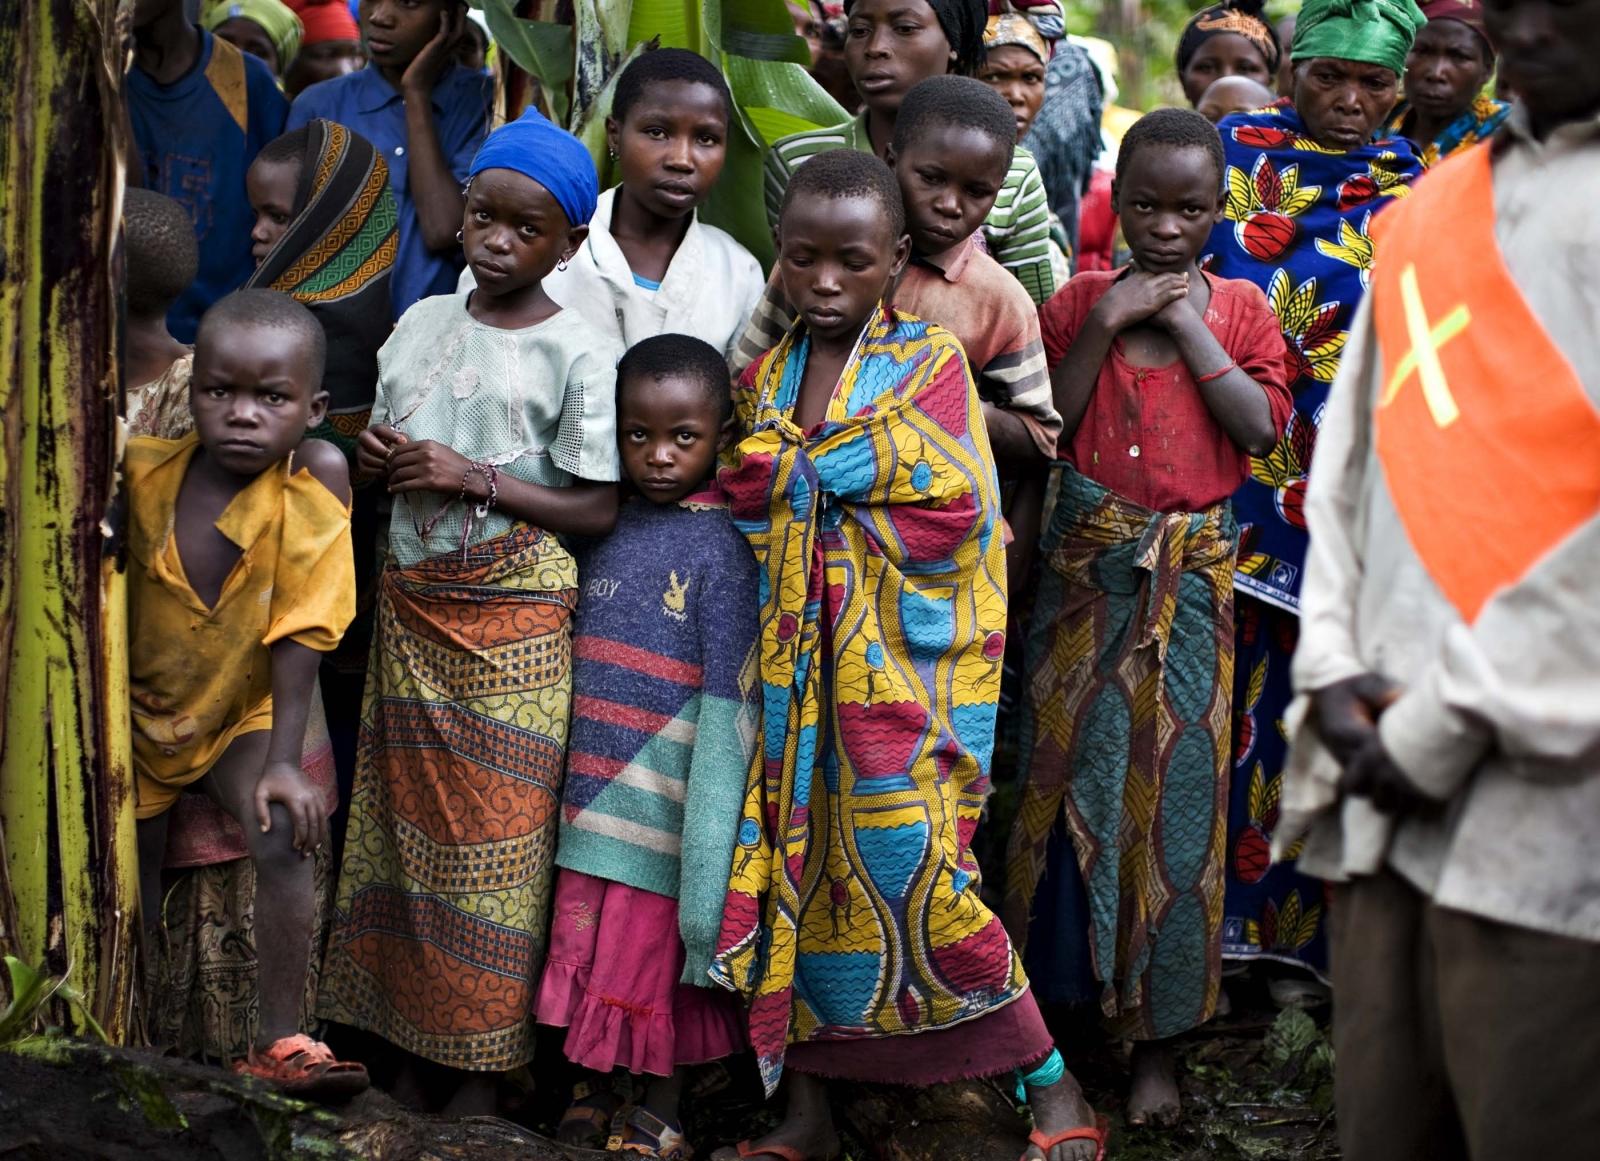 Civilians at risk in DRC